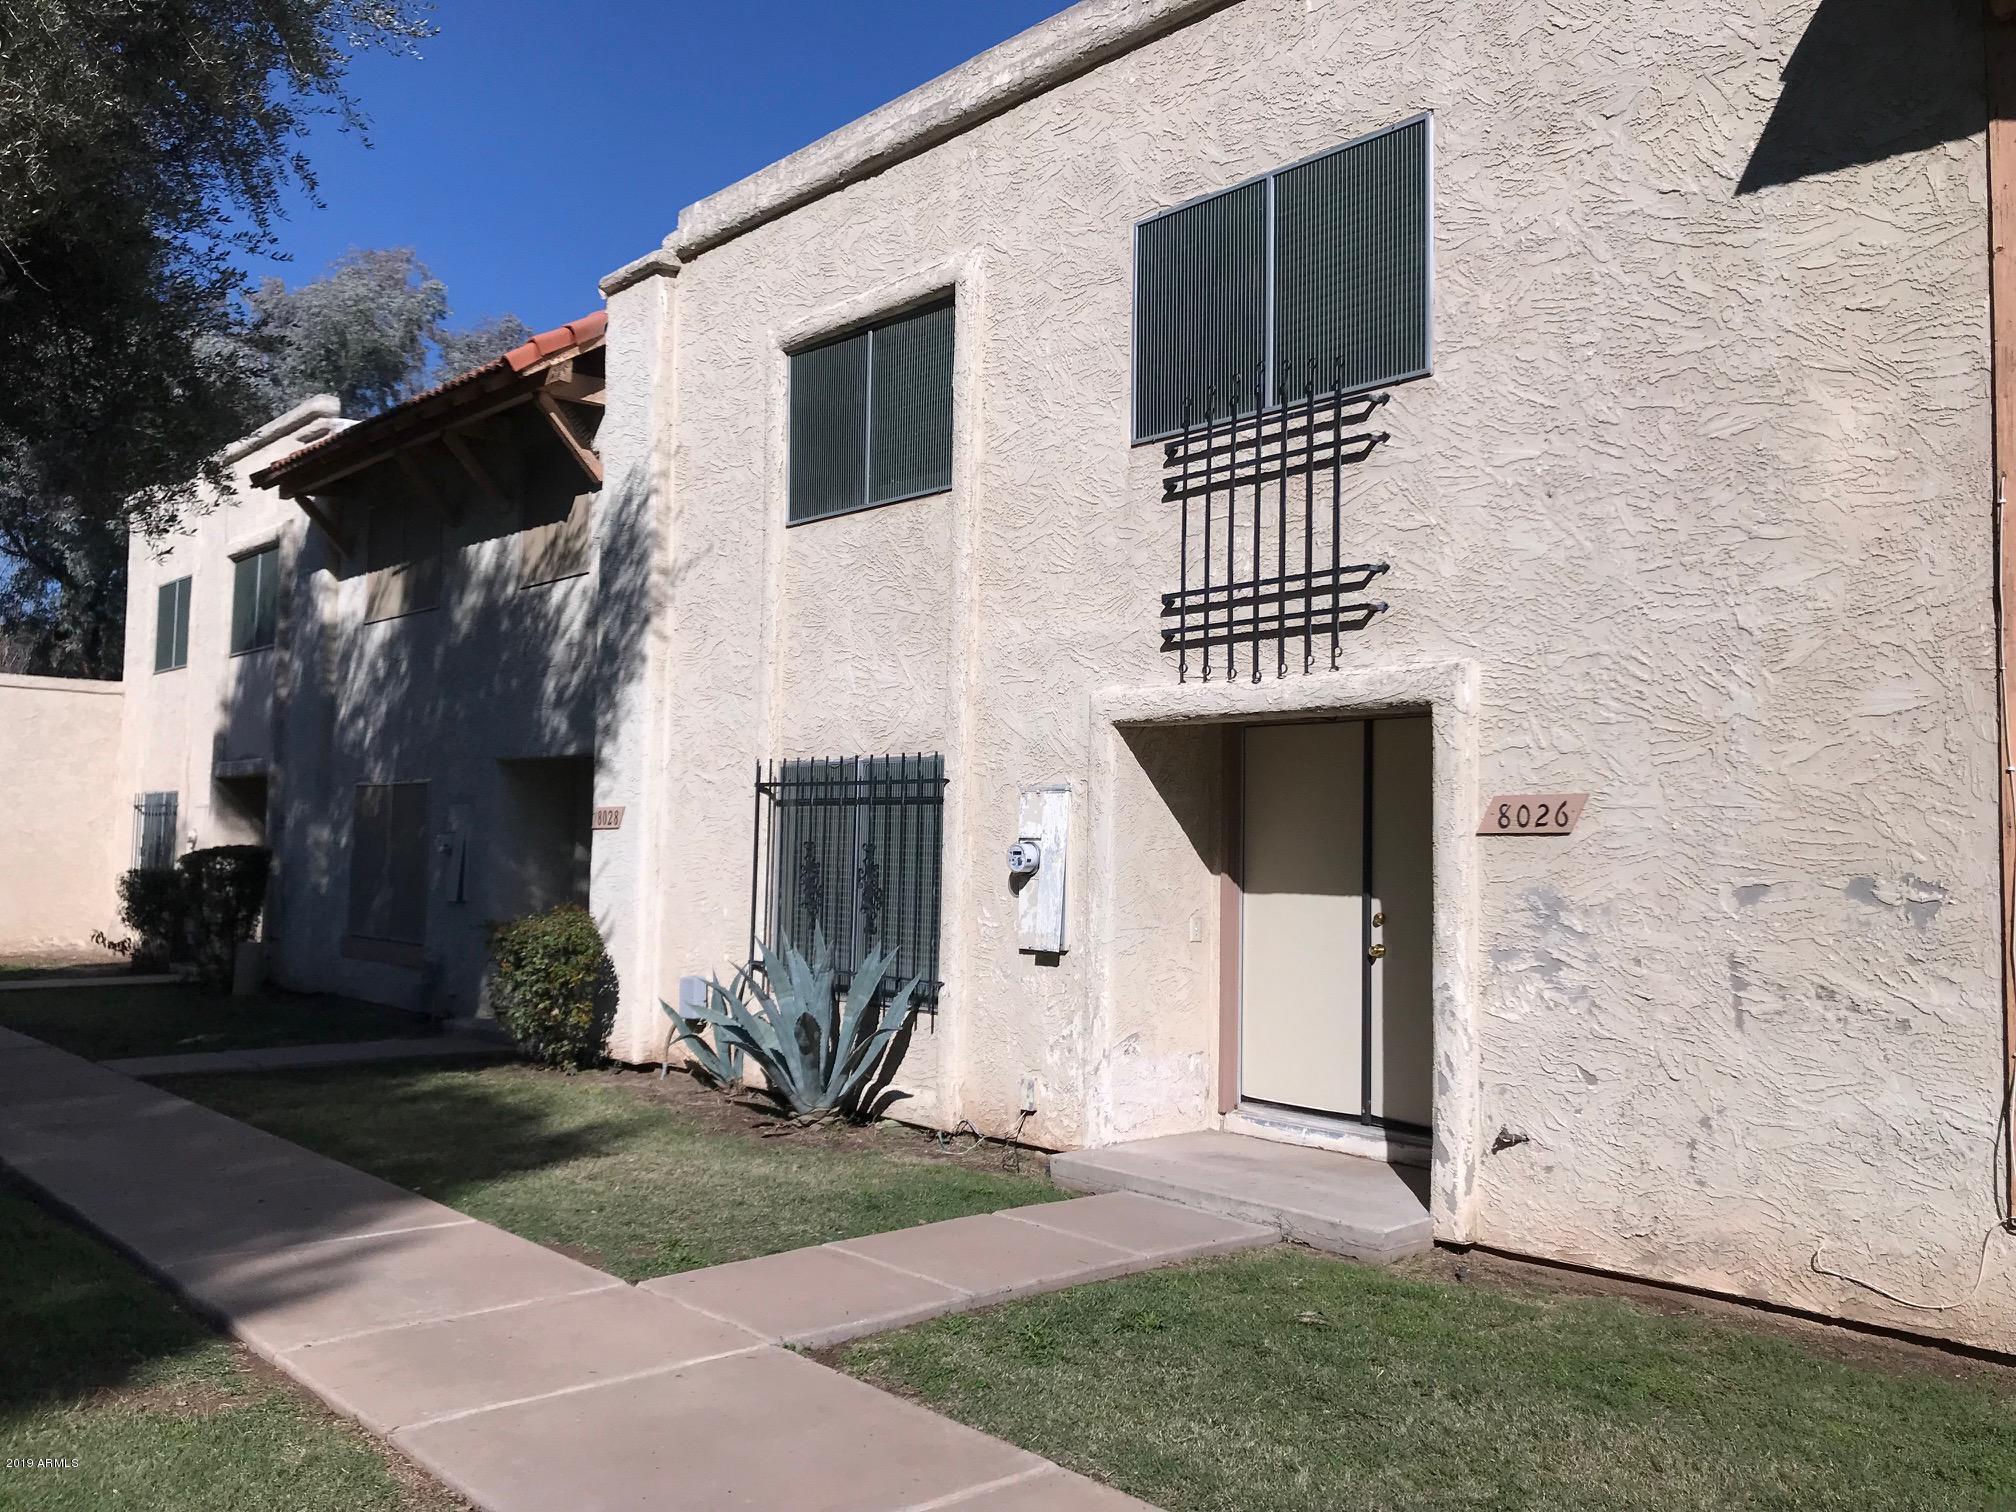 Photo of 8026 N 32nd Avenue, Phoenix, AZ 85051